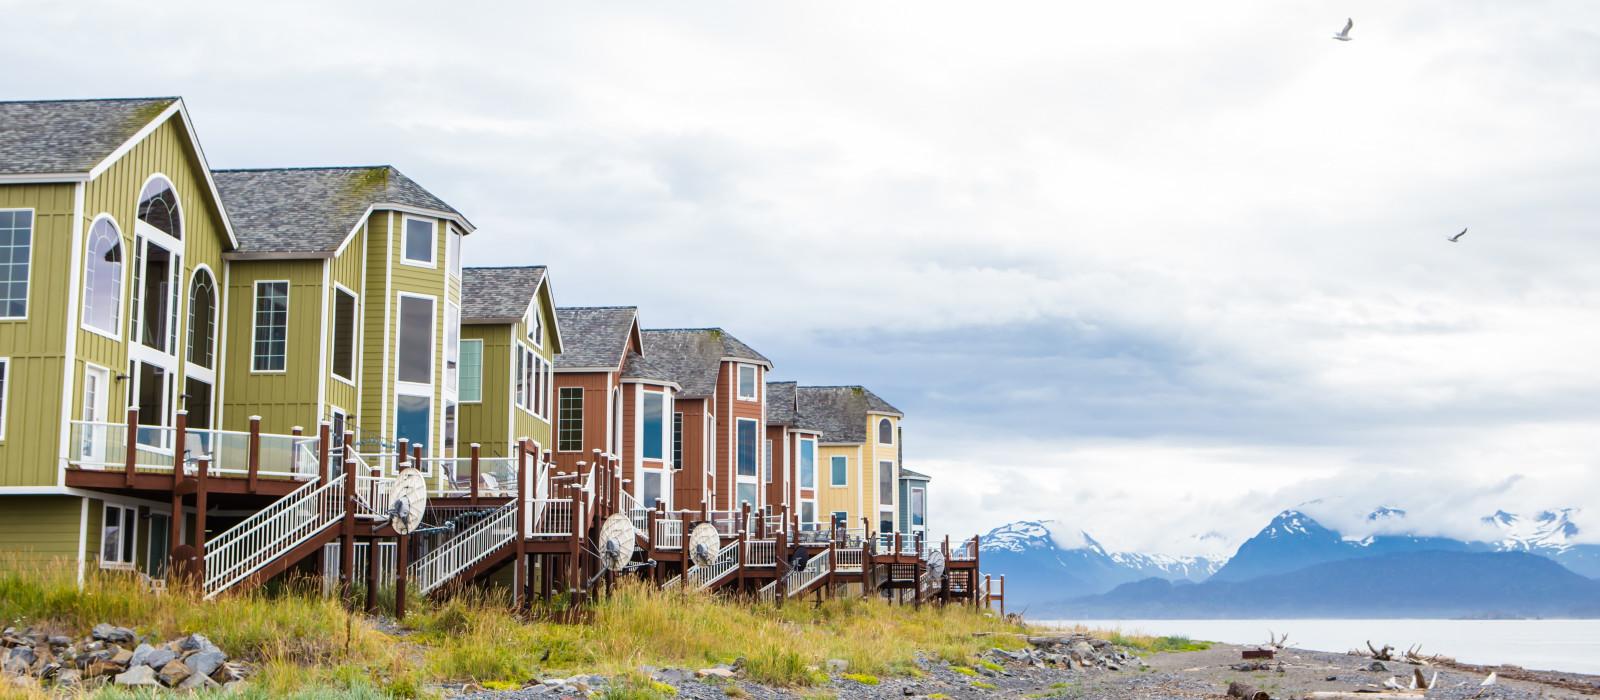 Alaska Roadtrip – legendäre Landschaften und Denali Nationalpark Urlaub 1